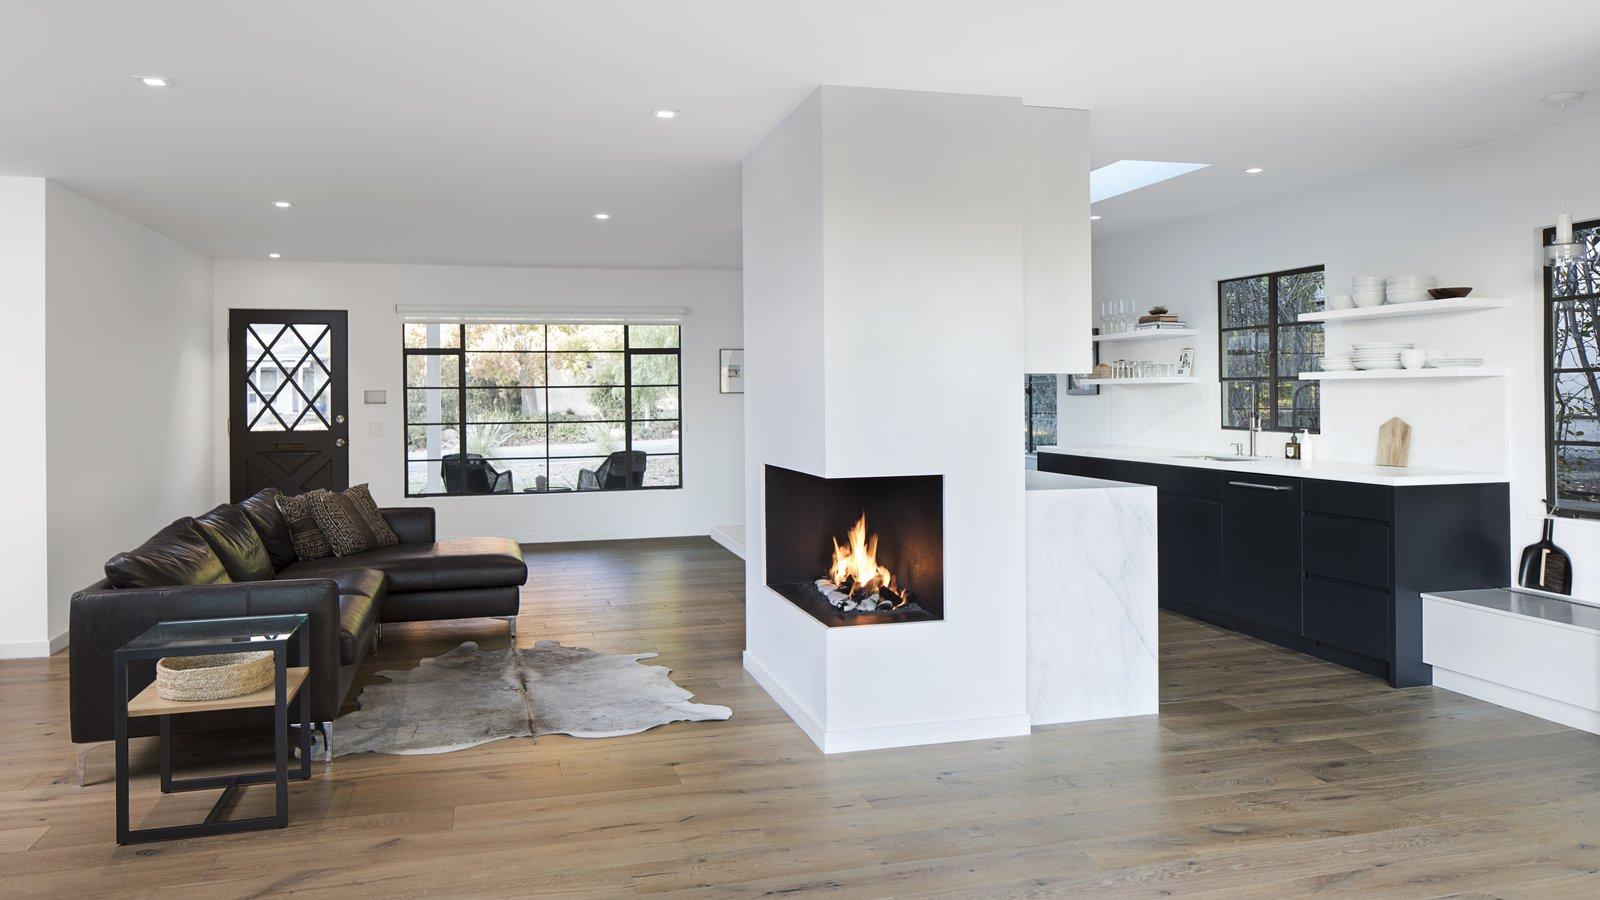 Living Room, Ceiling Lighting, Light Hardwood Floor, Sofa, and Corner Fireplace  Vista De la Cumbra